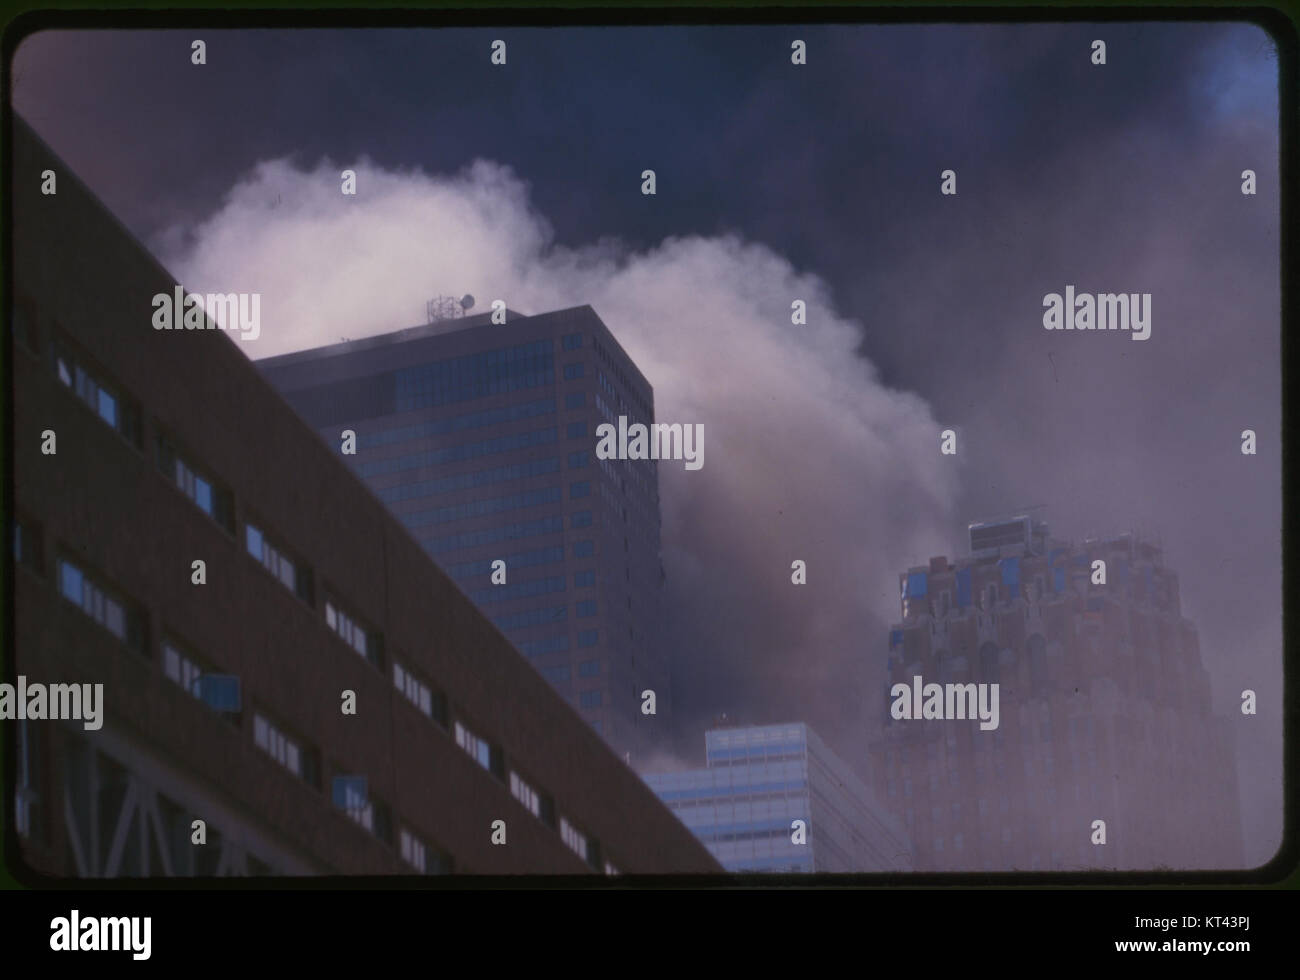 LOC unattributed Ground Zero photos, September 11, 2001 - item 61 - Stock Image